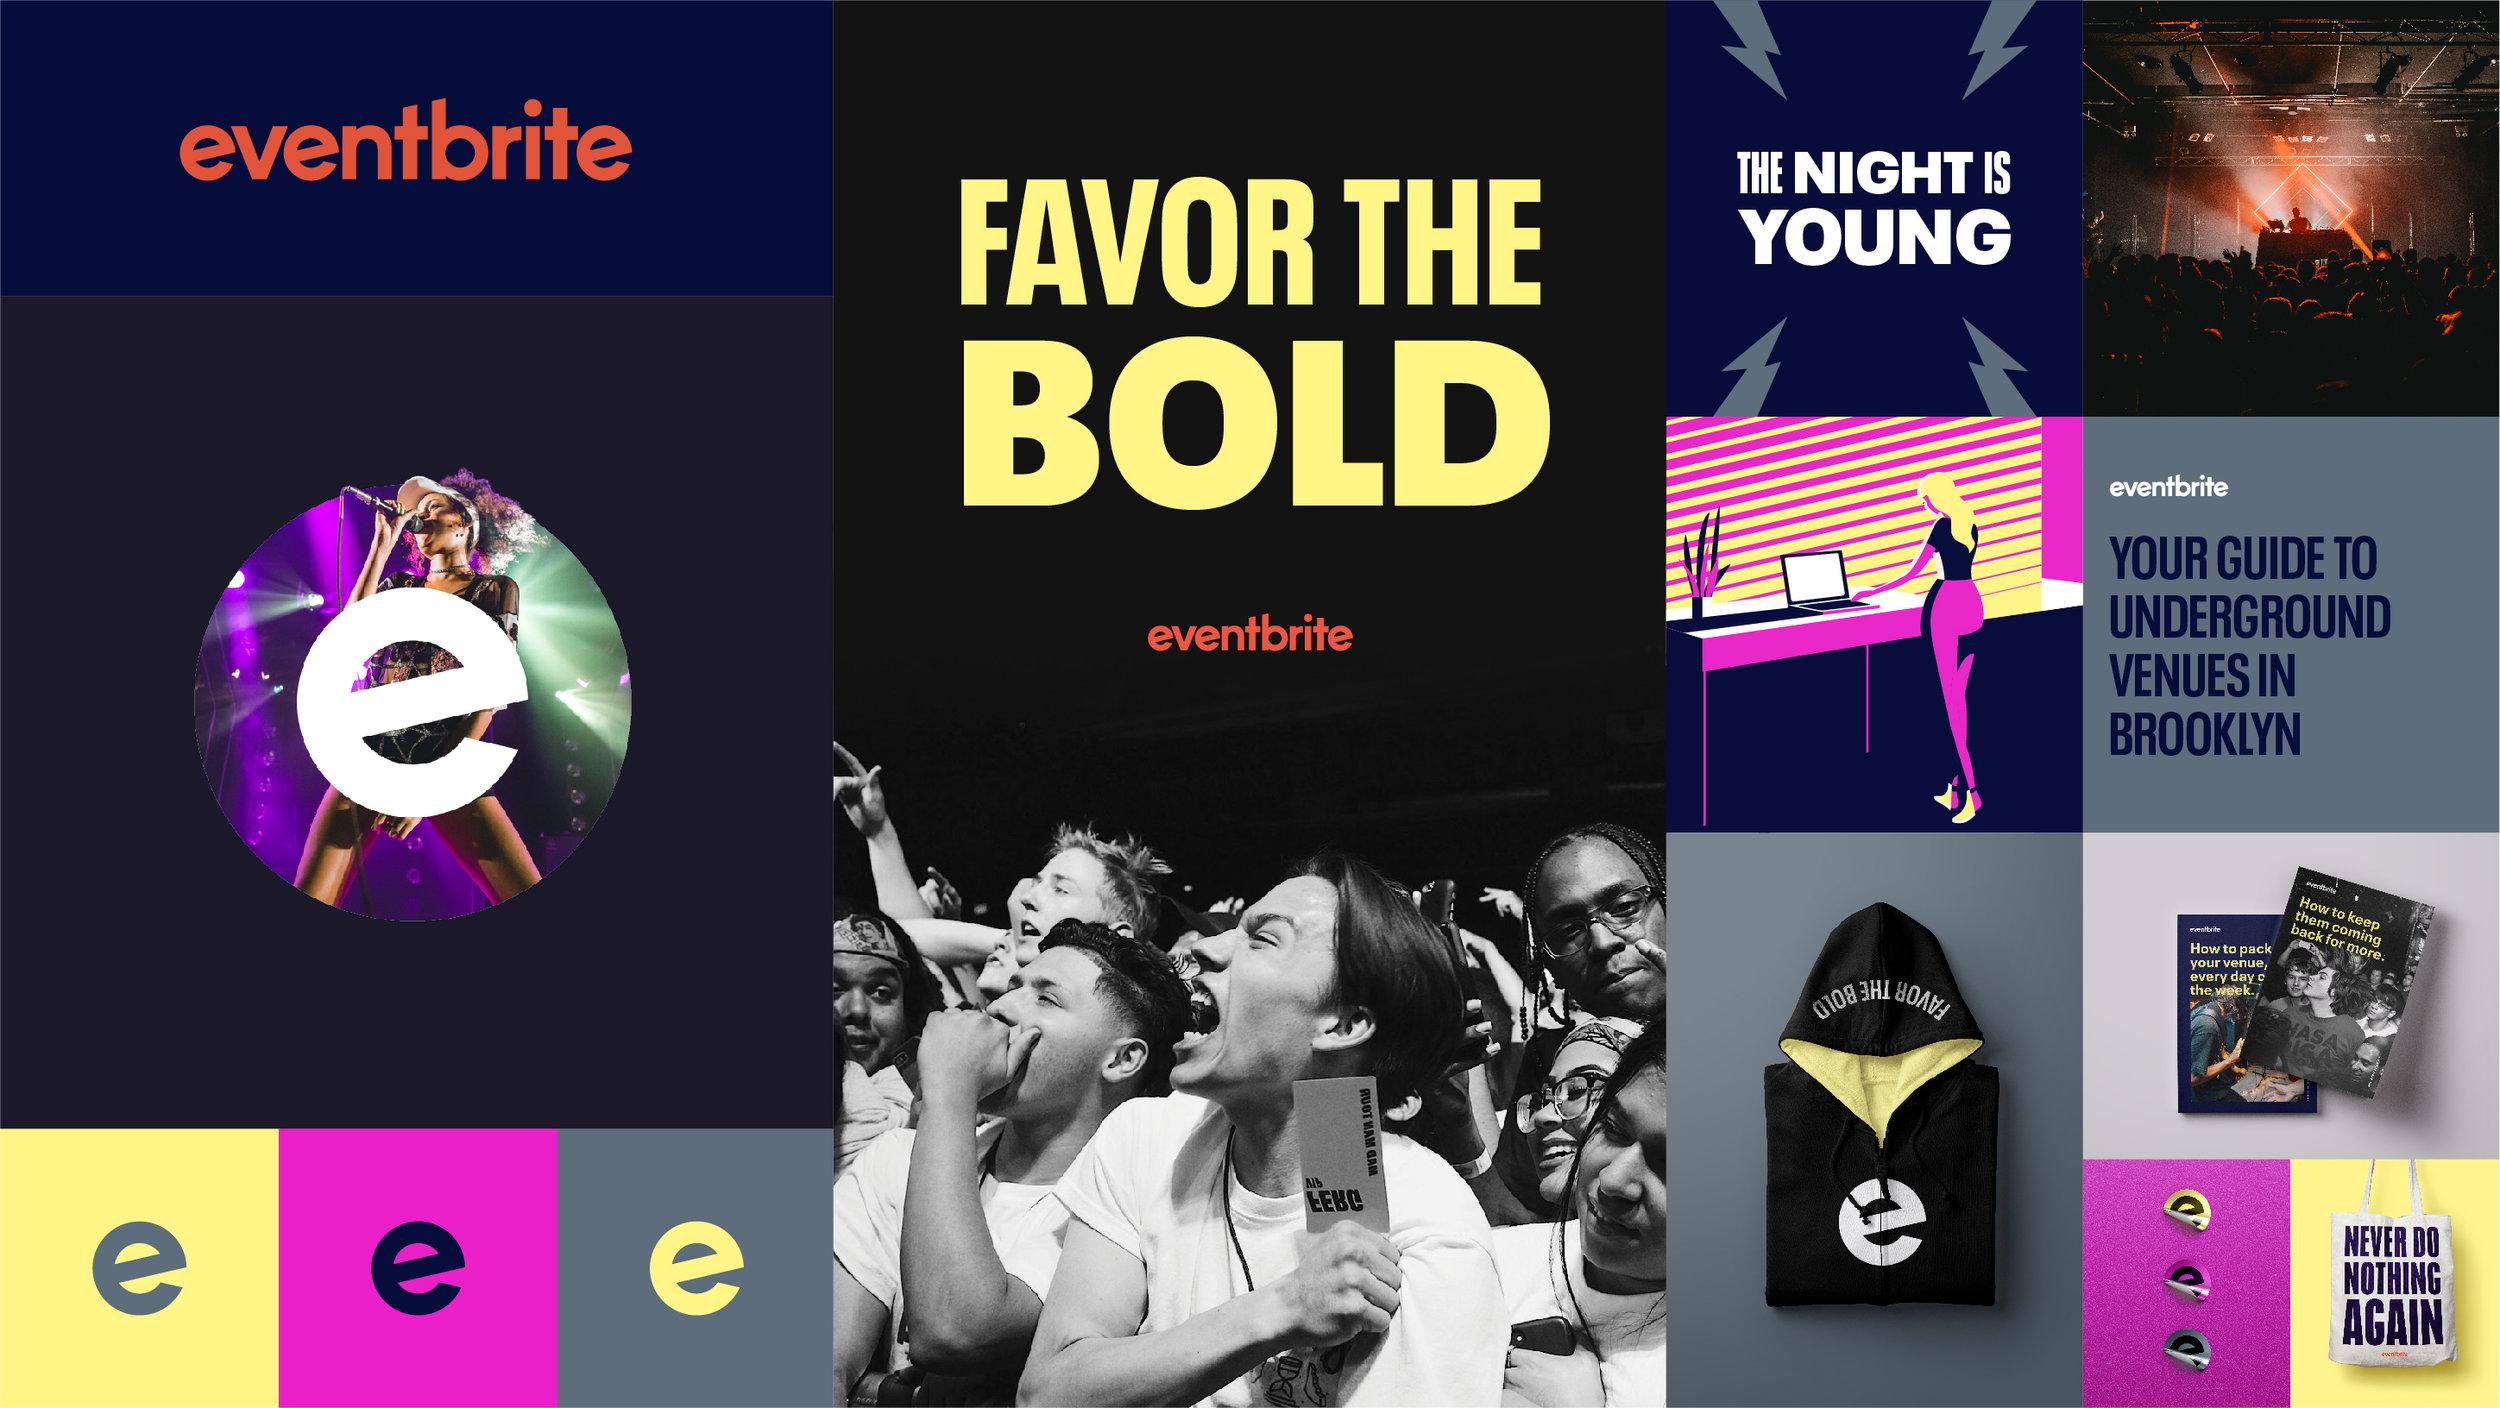 Brand mood slides EDGY.jpg